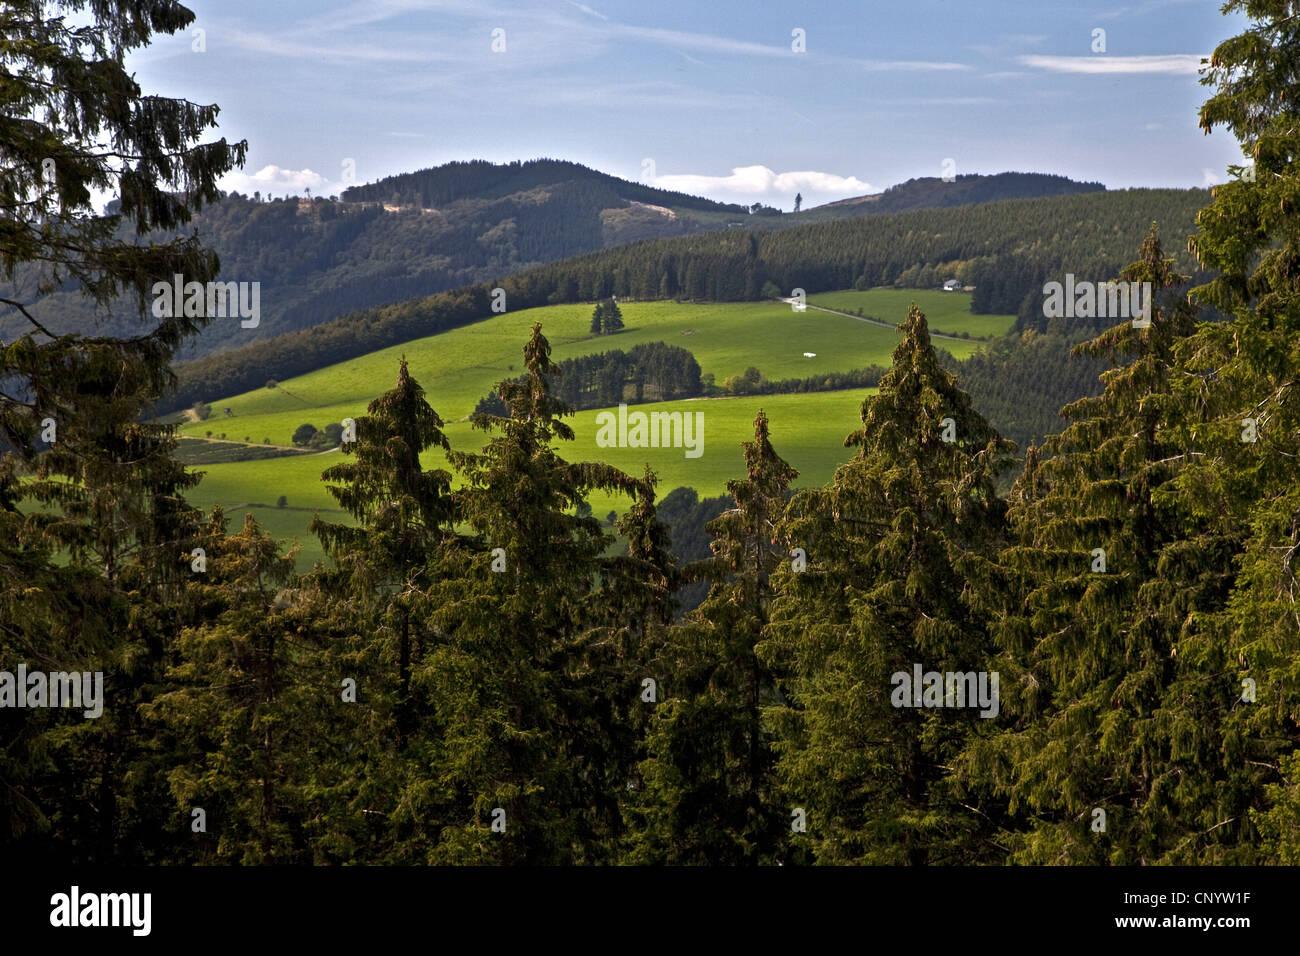 Vista de paisajes de colinas de Bruchhauser Steine, Alemania, Renania del Norte-Westfalia, Olsberg Imagen De Stock